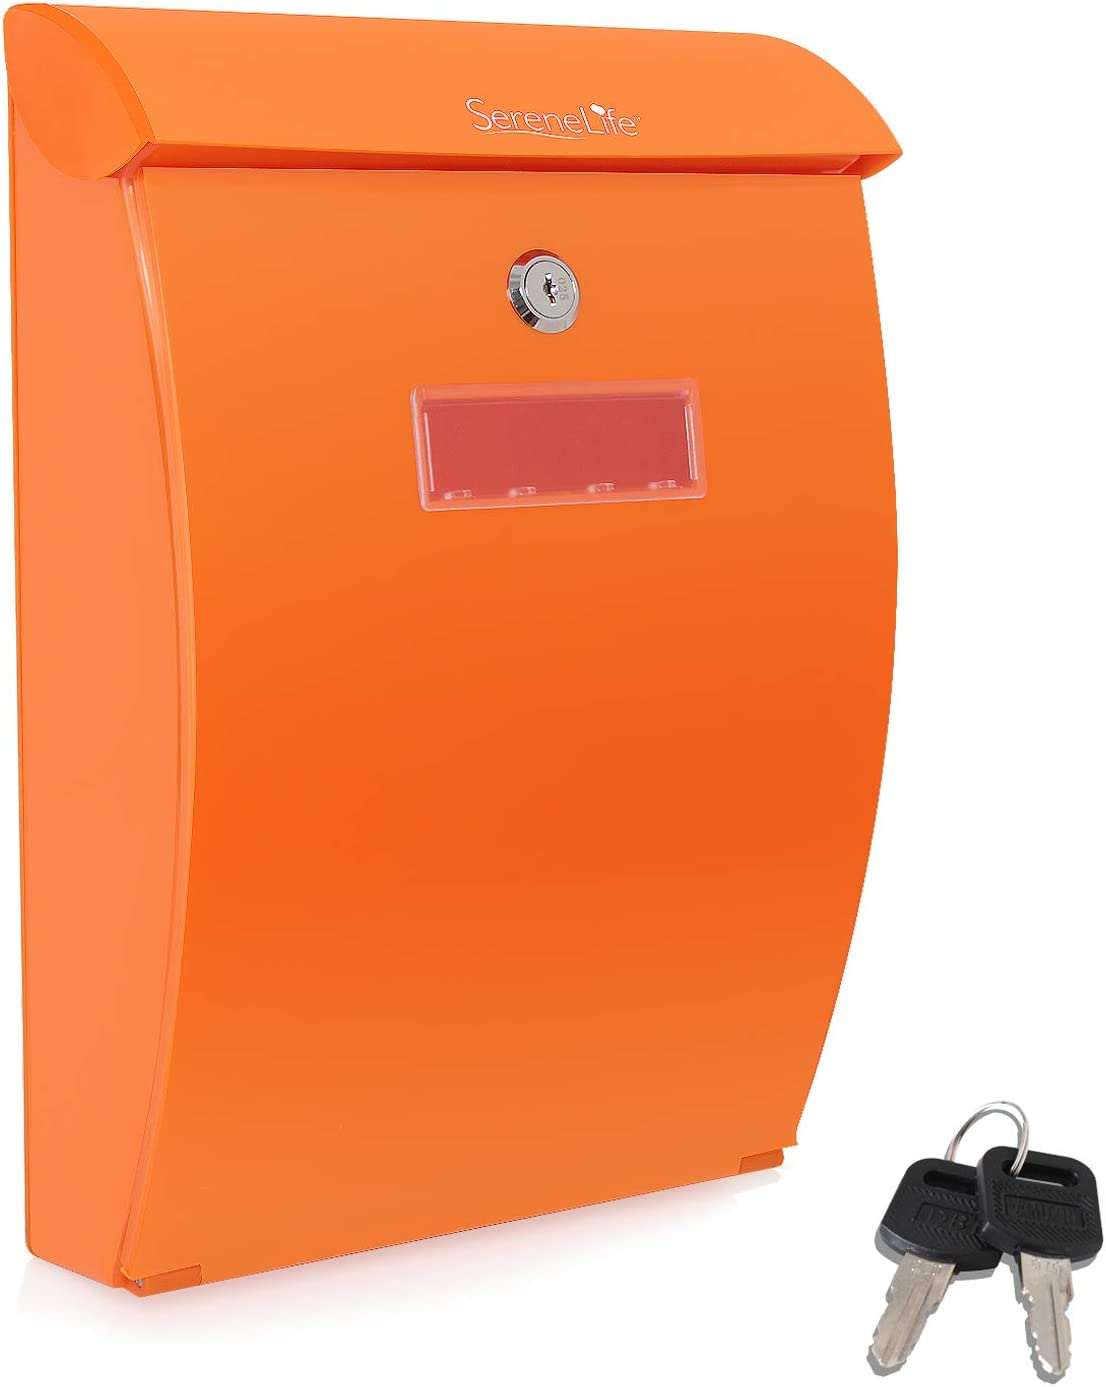 Modern Wall Mount Locking Mailbox Max 89% OFF Super sale Outdoor Indoor - Ver Universal